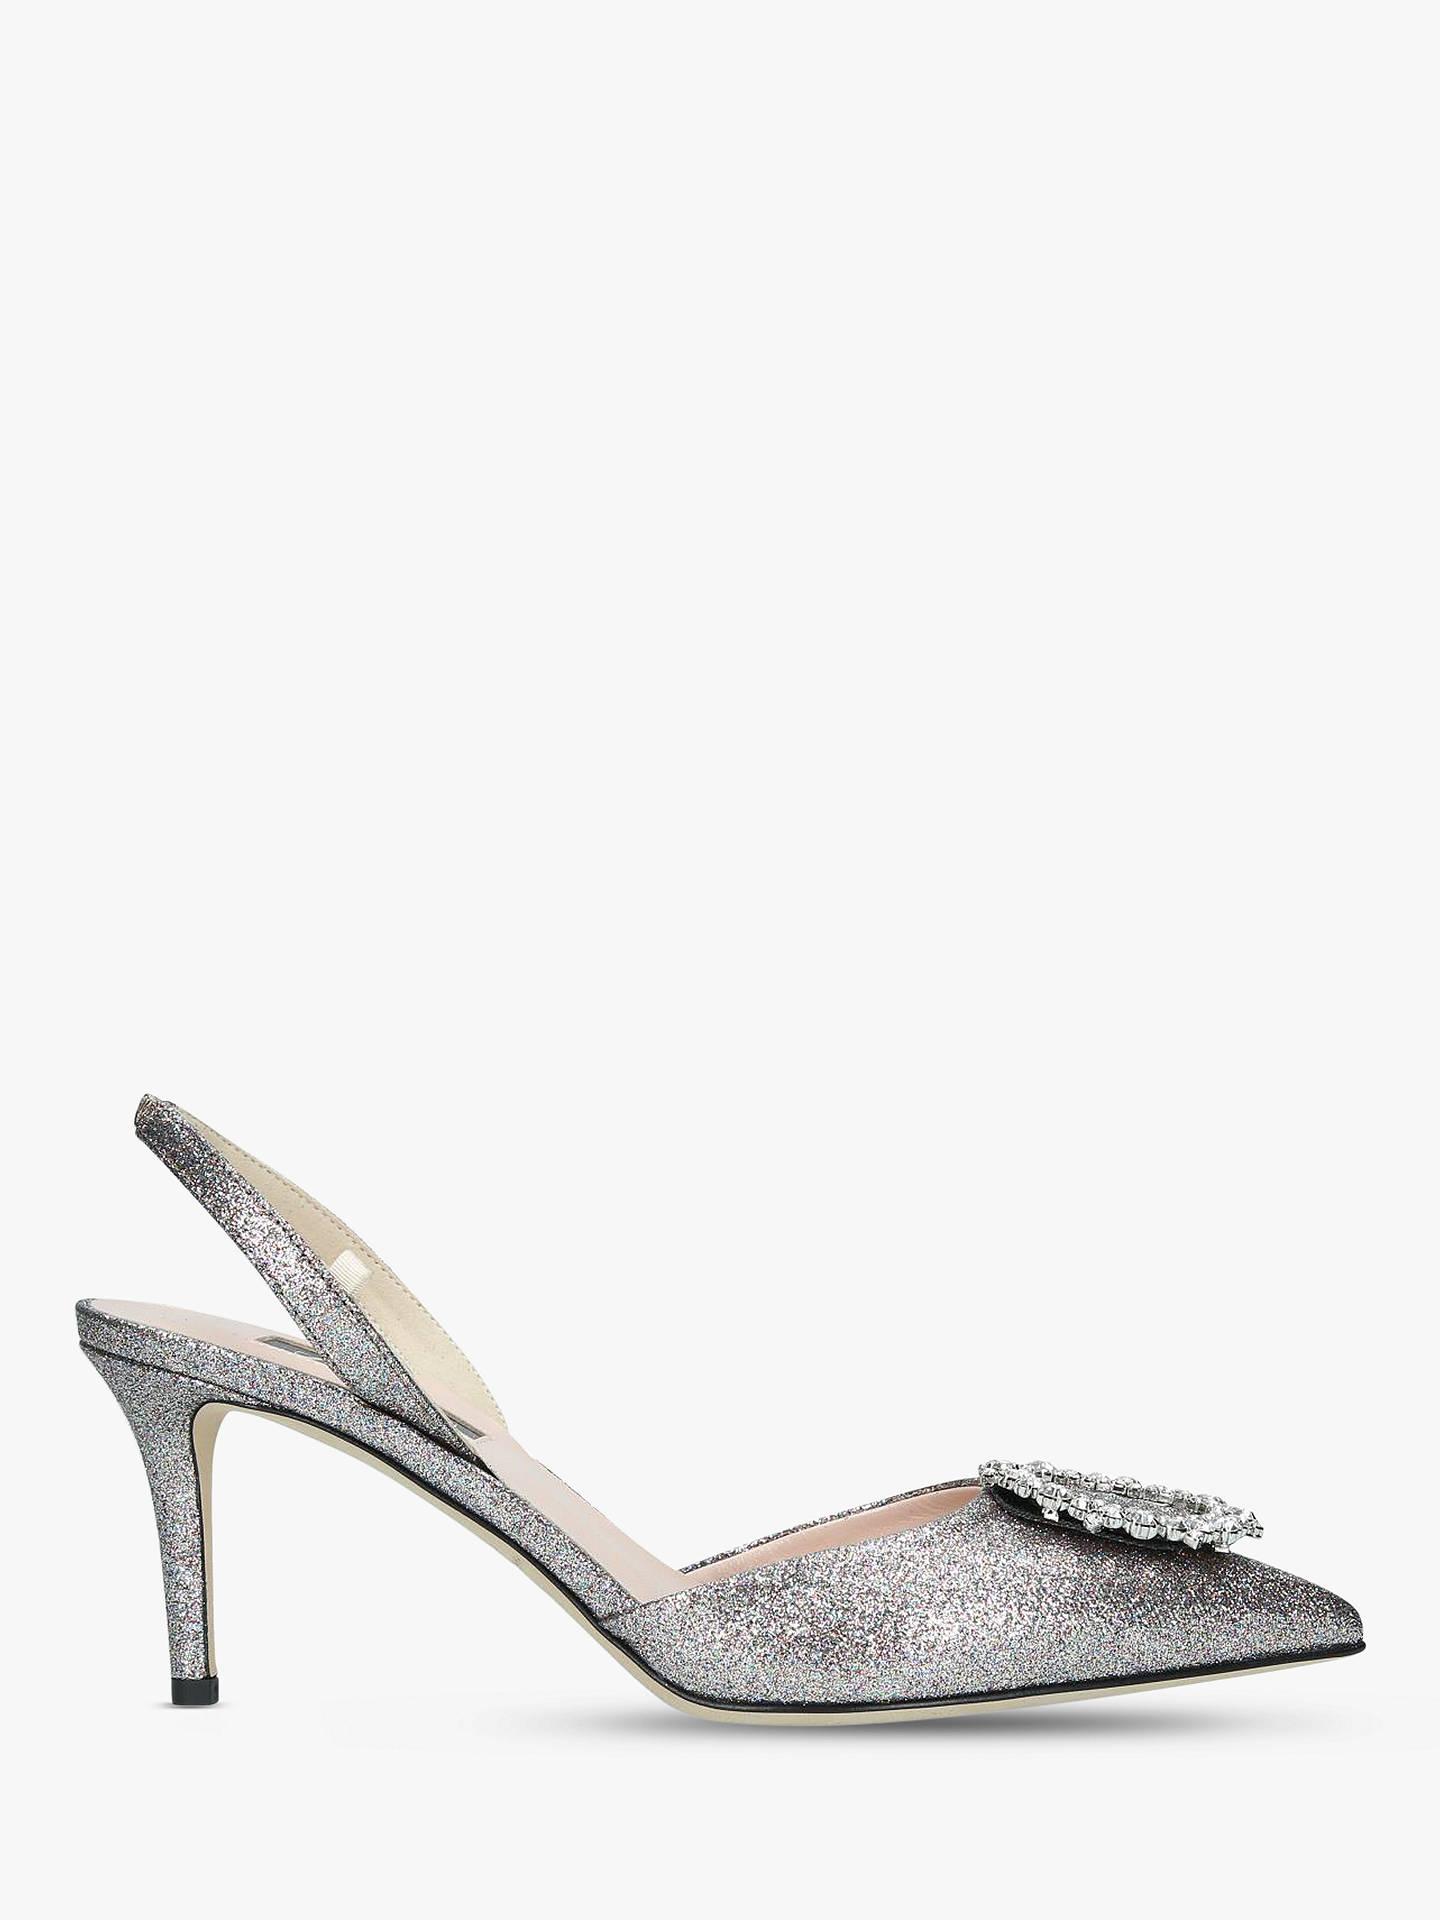 b19c7f224d5 Buy SJP by Sarah Jessica Parker Mabel Slingback Court Shoes